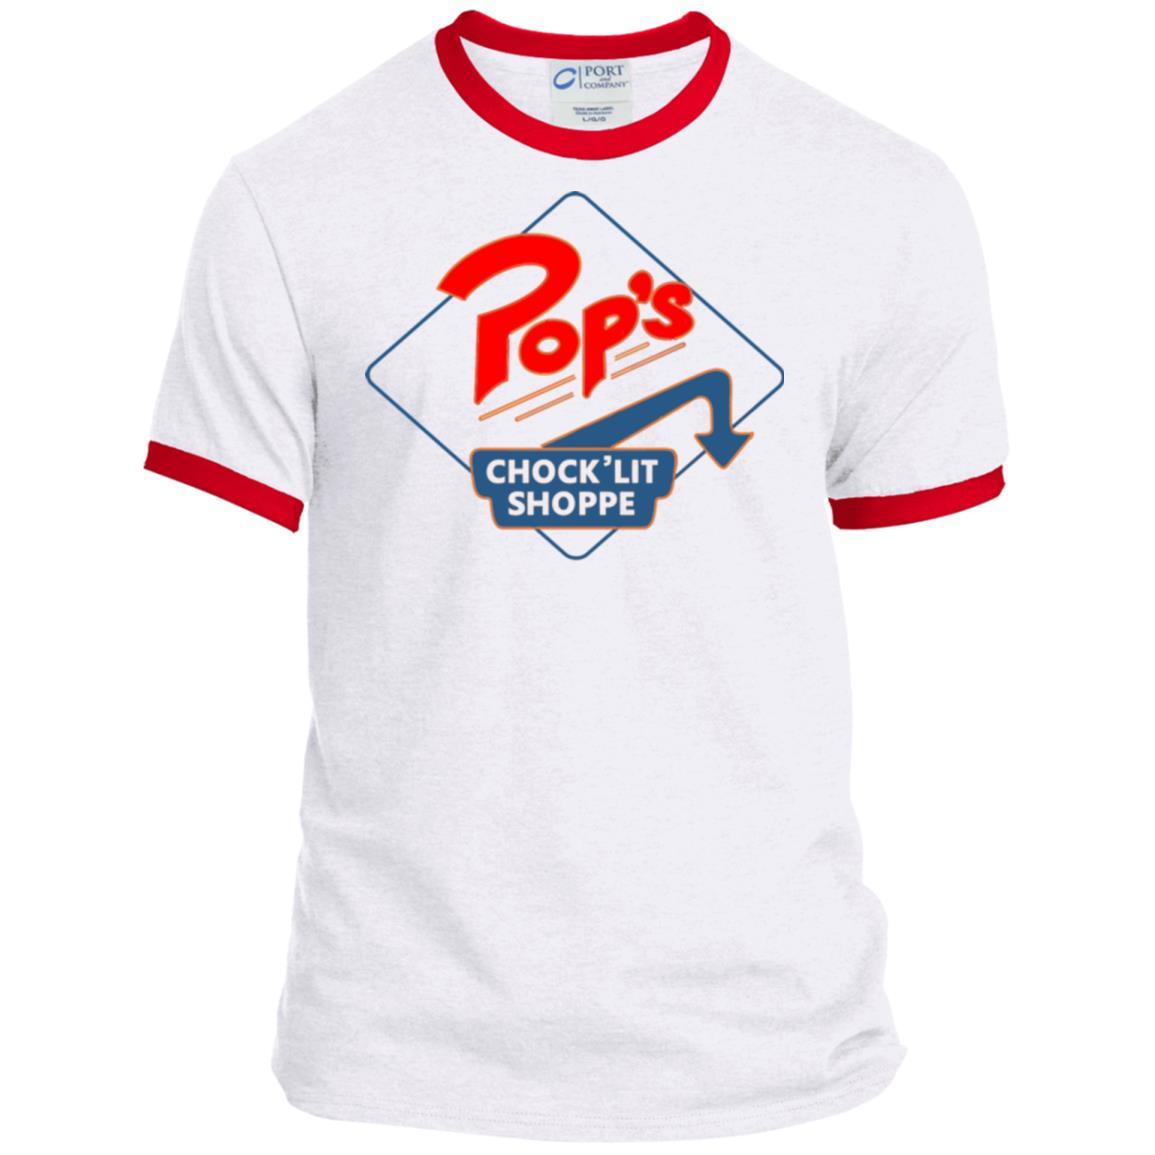 image 2088 - Riverdale Pop's Chock'lit Shoppe shirt